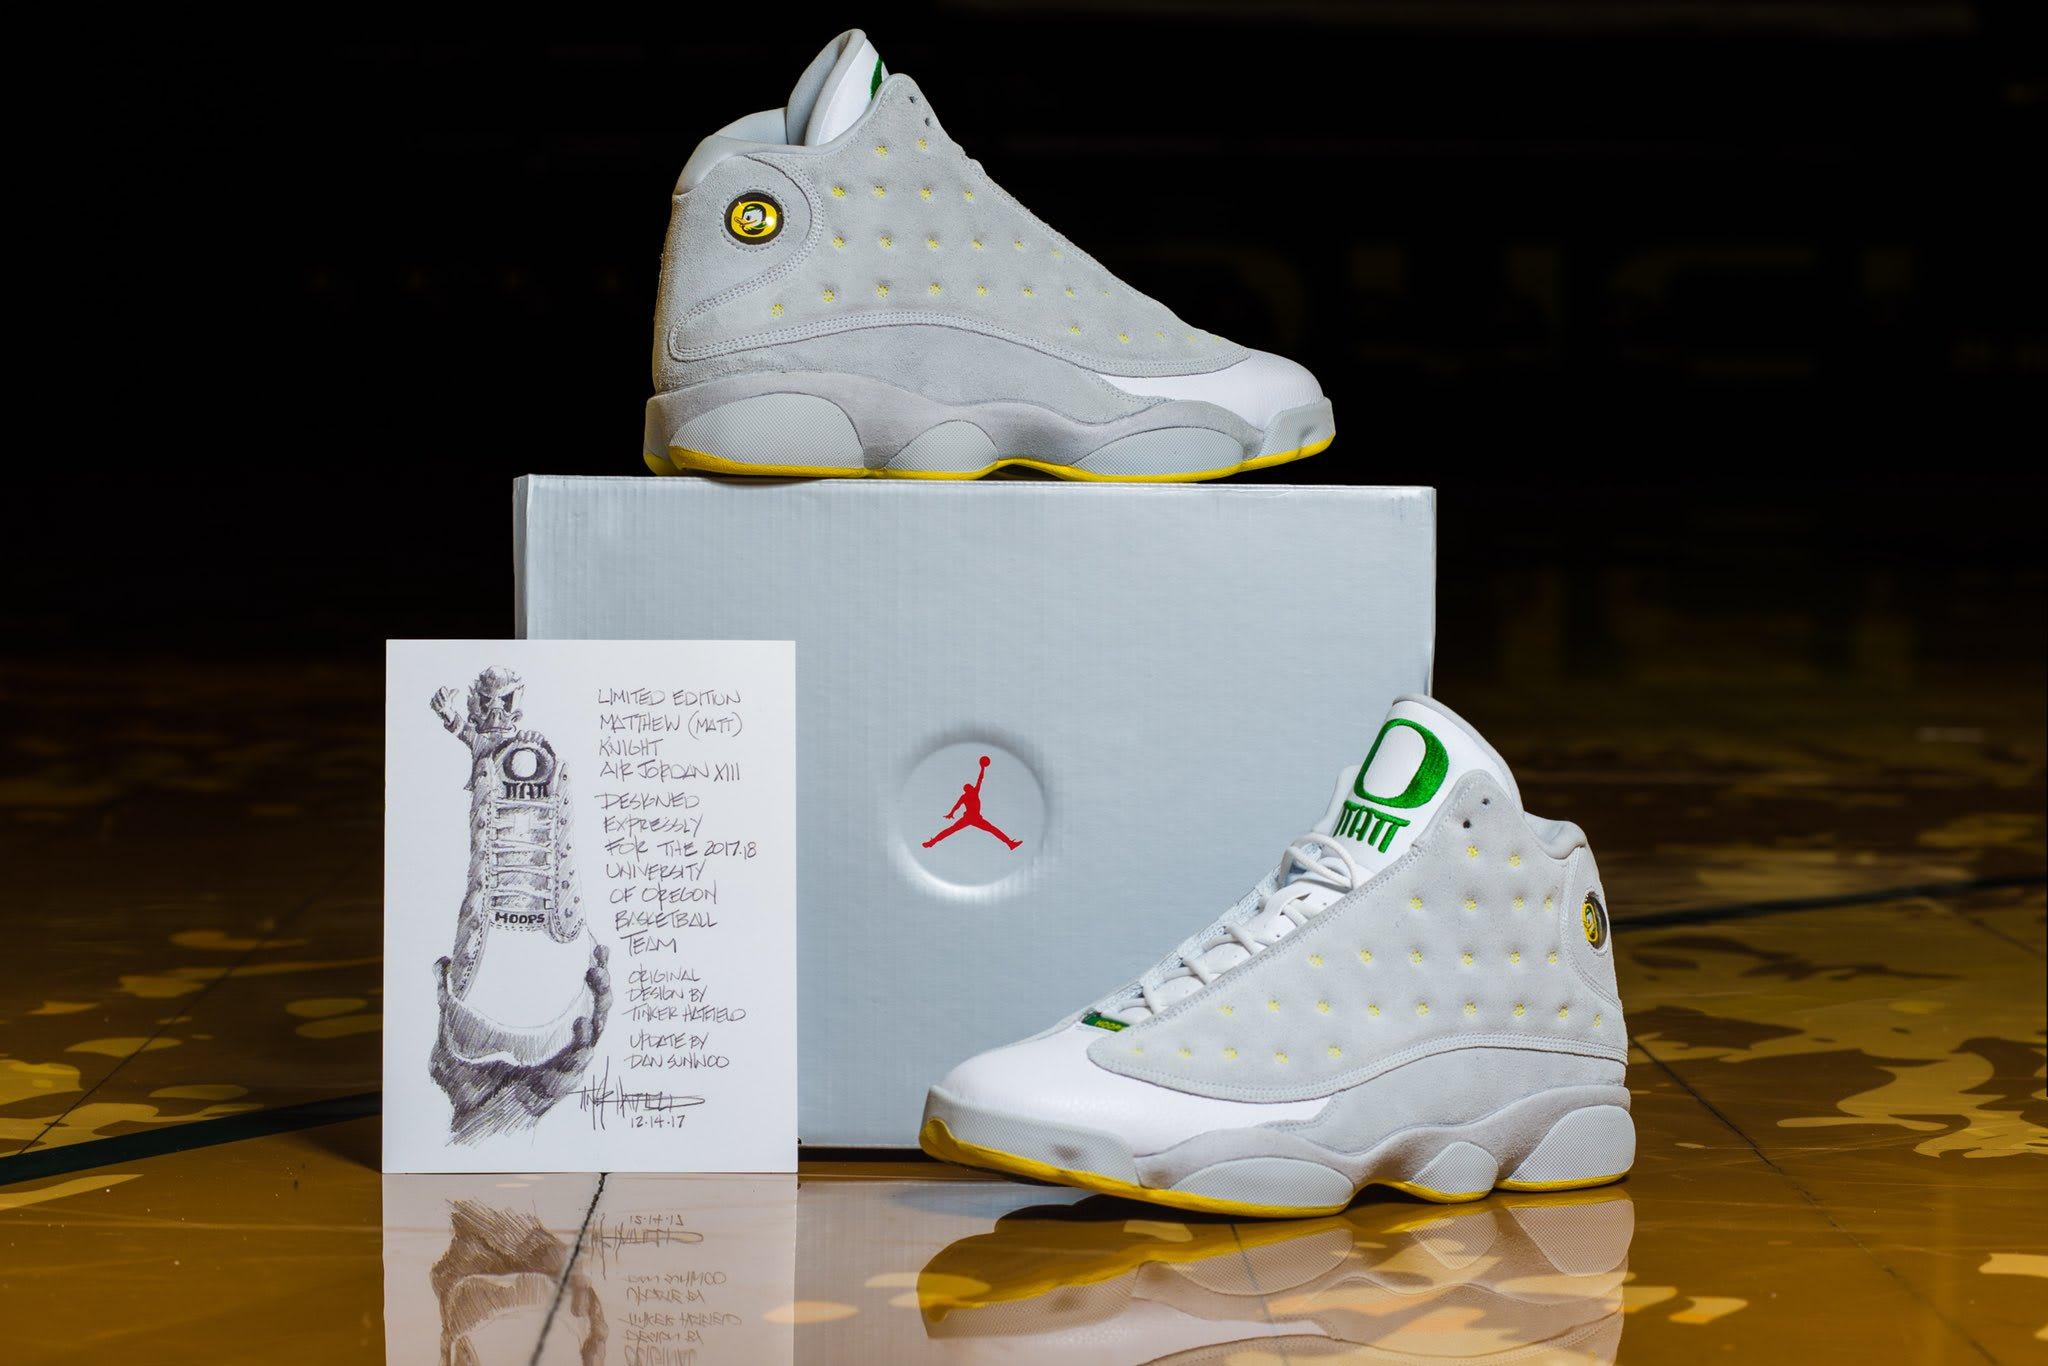 Durable Nike Air Jordan 5 Retro Suede Oregon Ducks